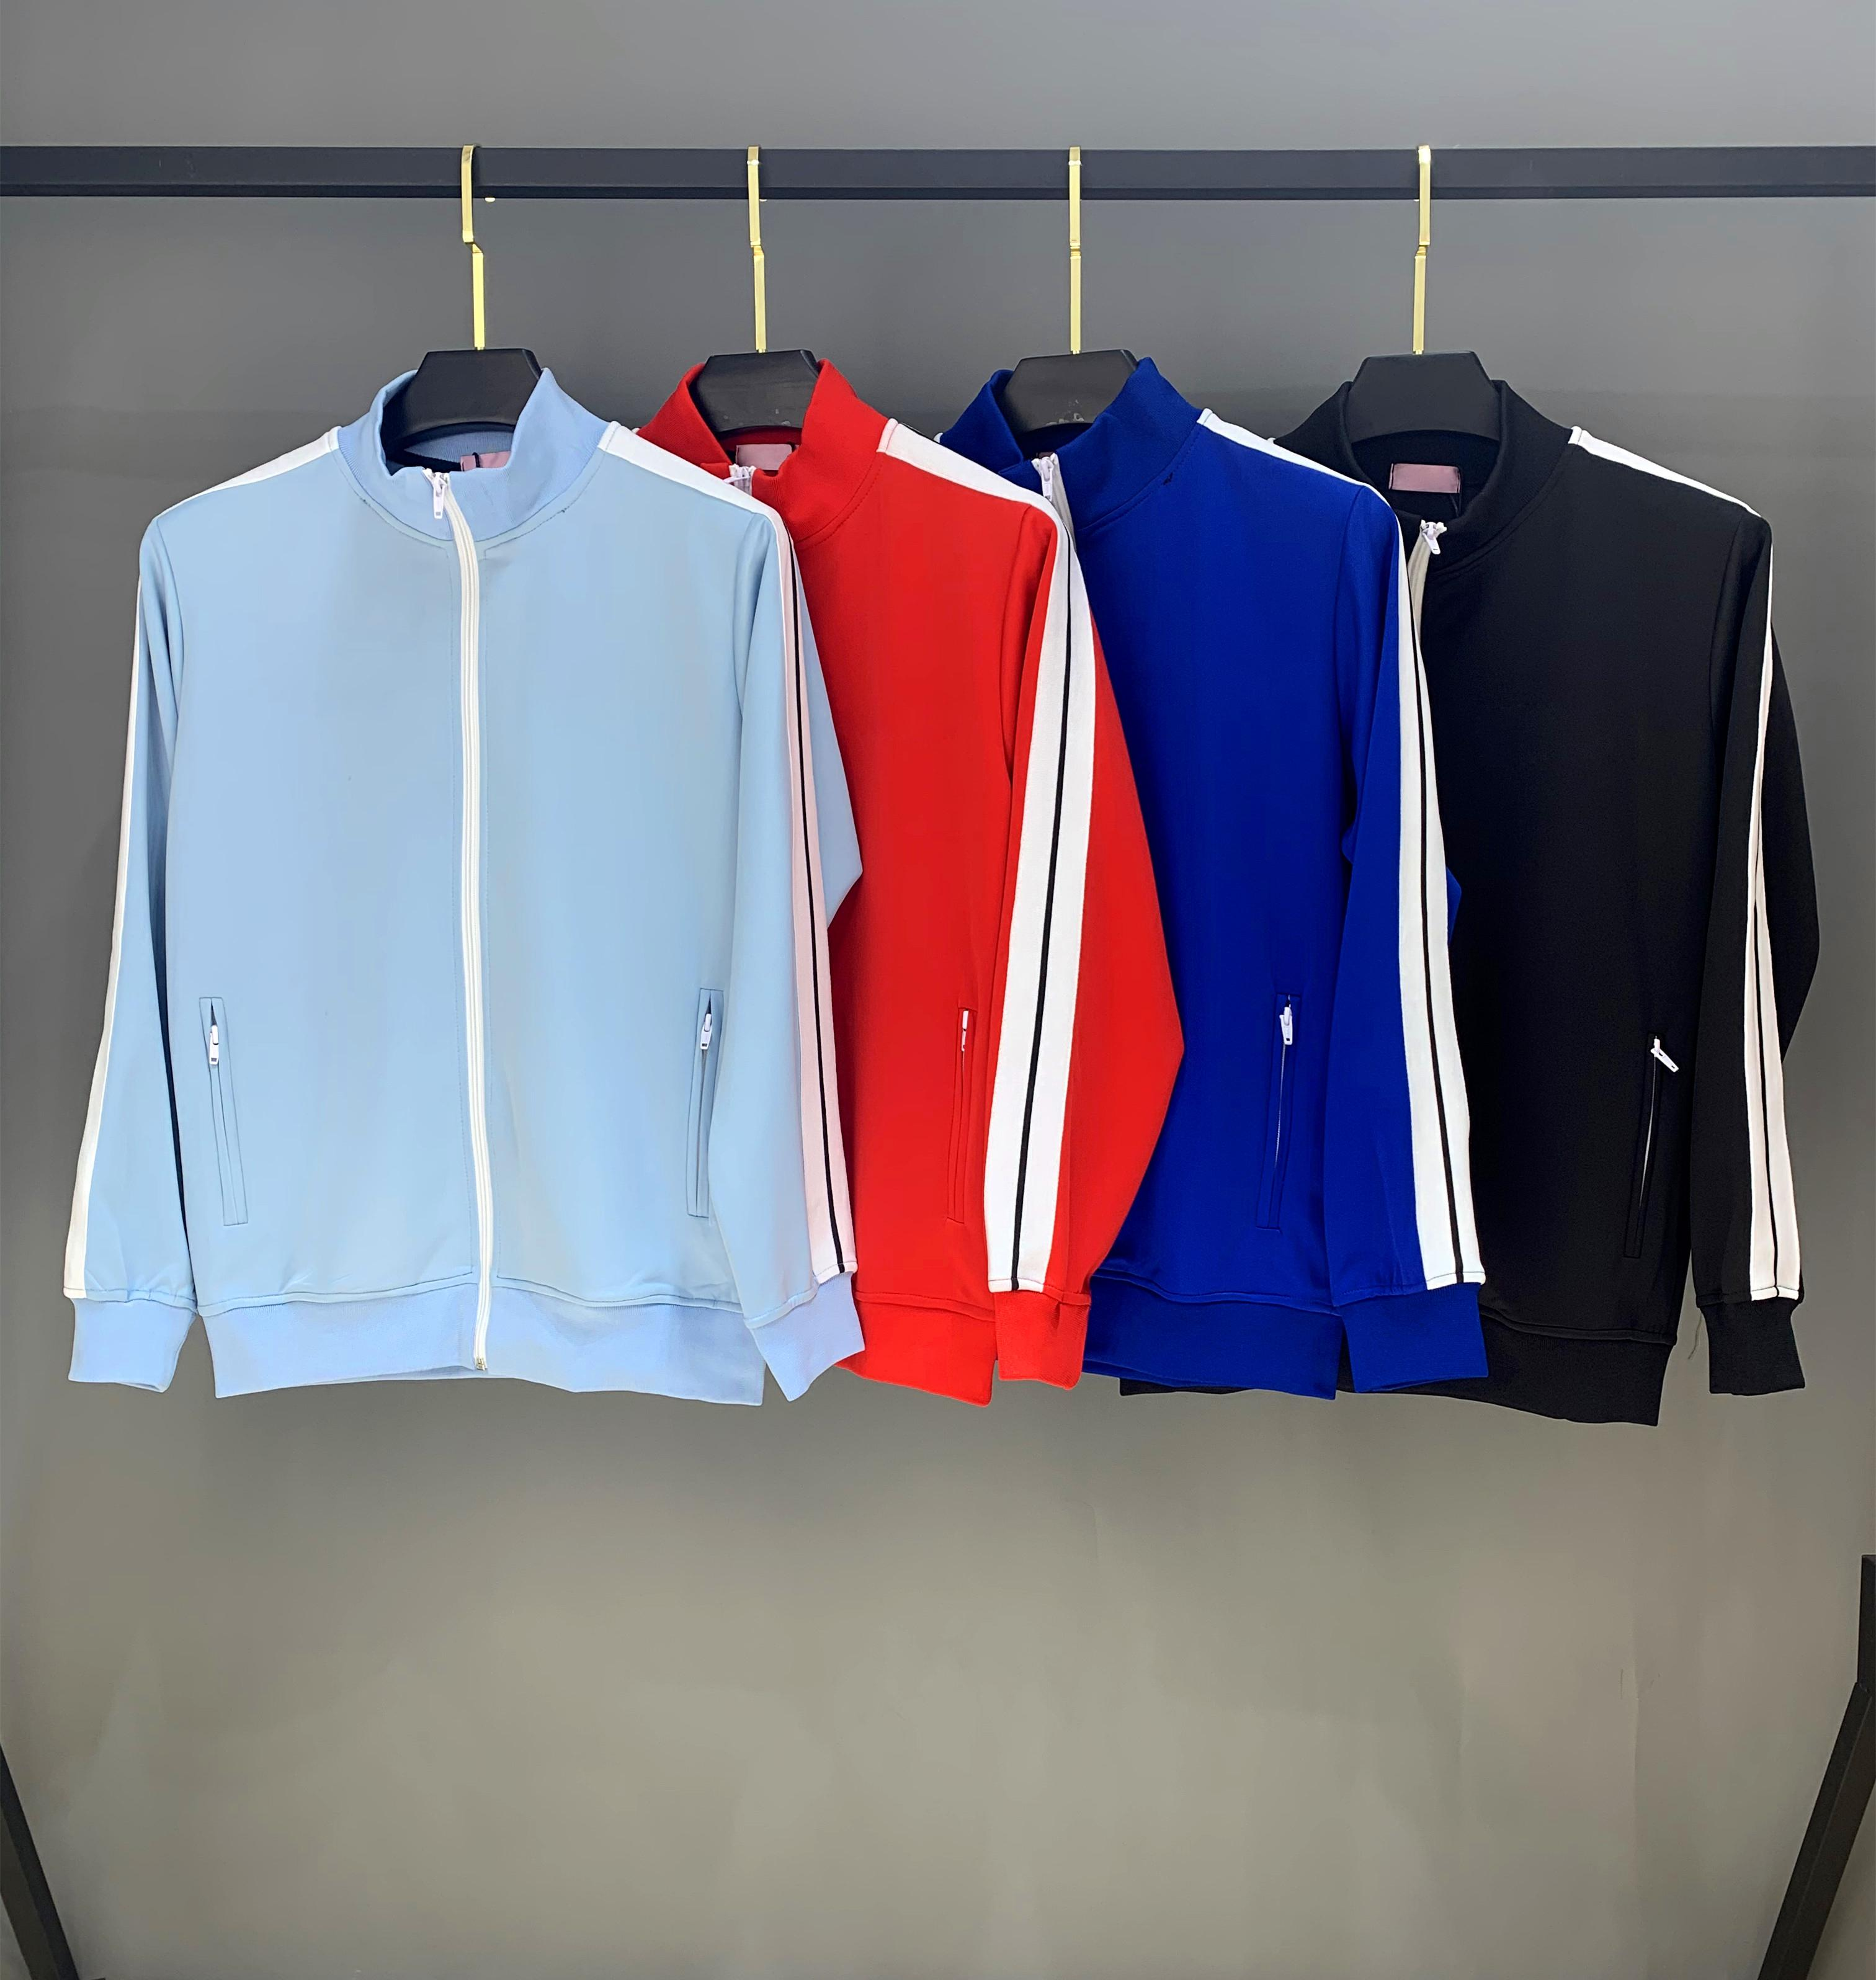 21ss Mens Designers Clothing Mens Tacksuit Men Chaqueta Hoodie Pantalones Hombres S Ropa Deporte Sudaderas Soopsuits Tamaño S-XL